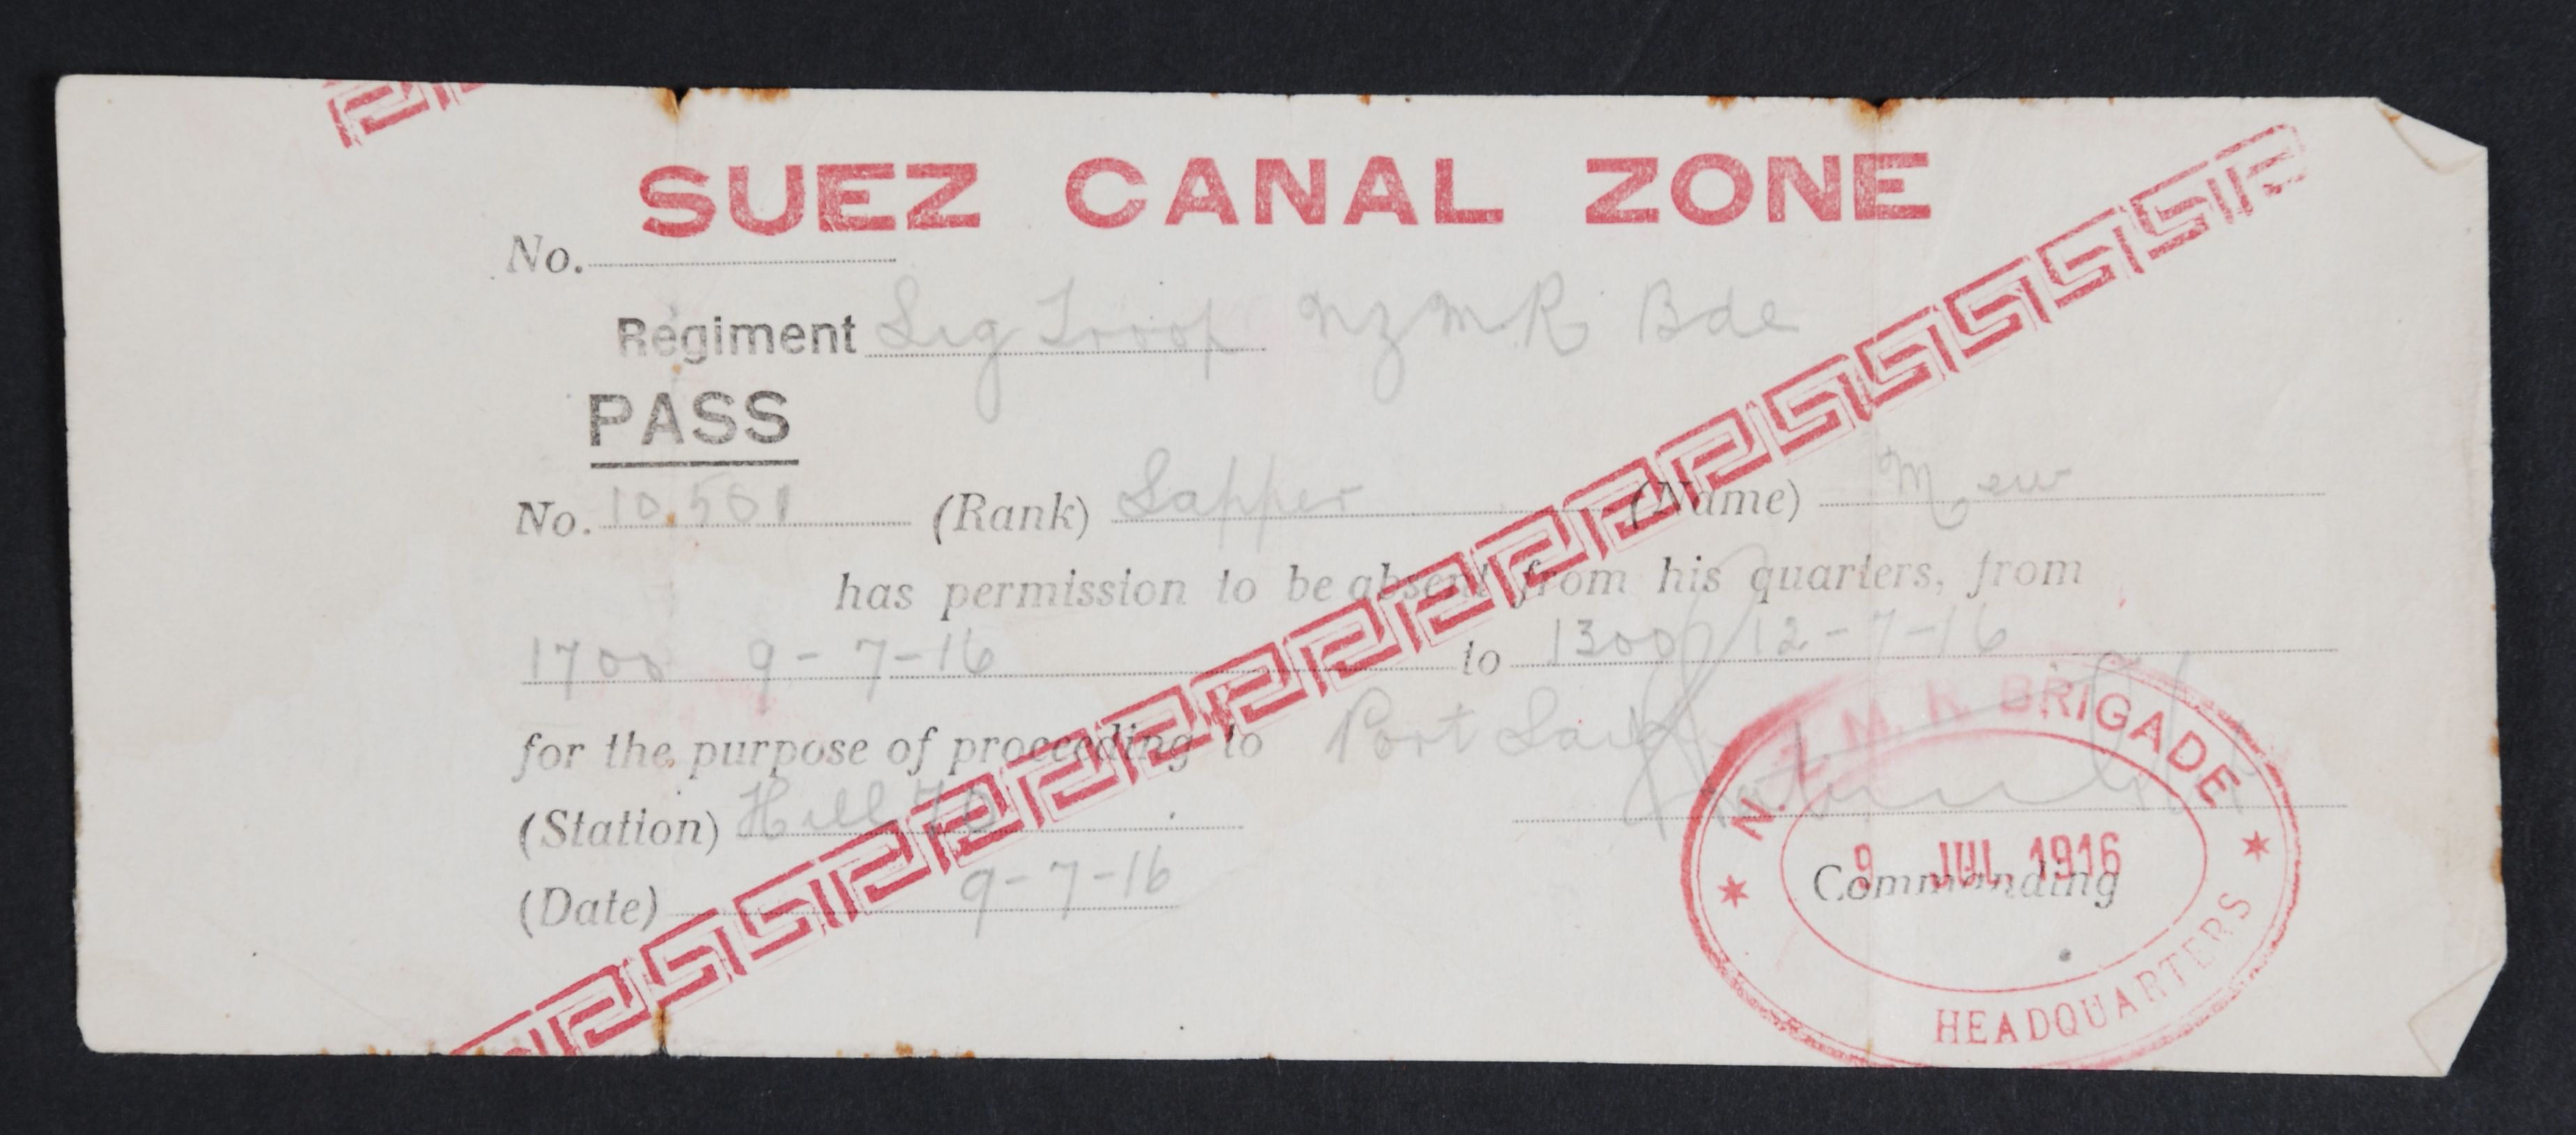 Suez Canal Zone Pass. NZMR Brigade Headquarters, 1916